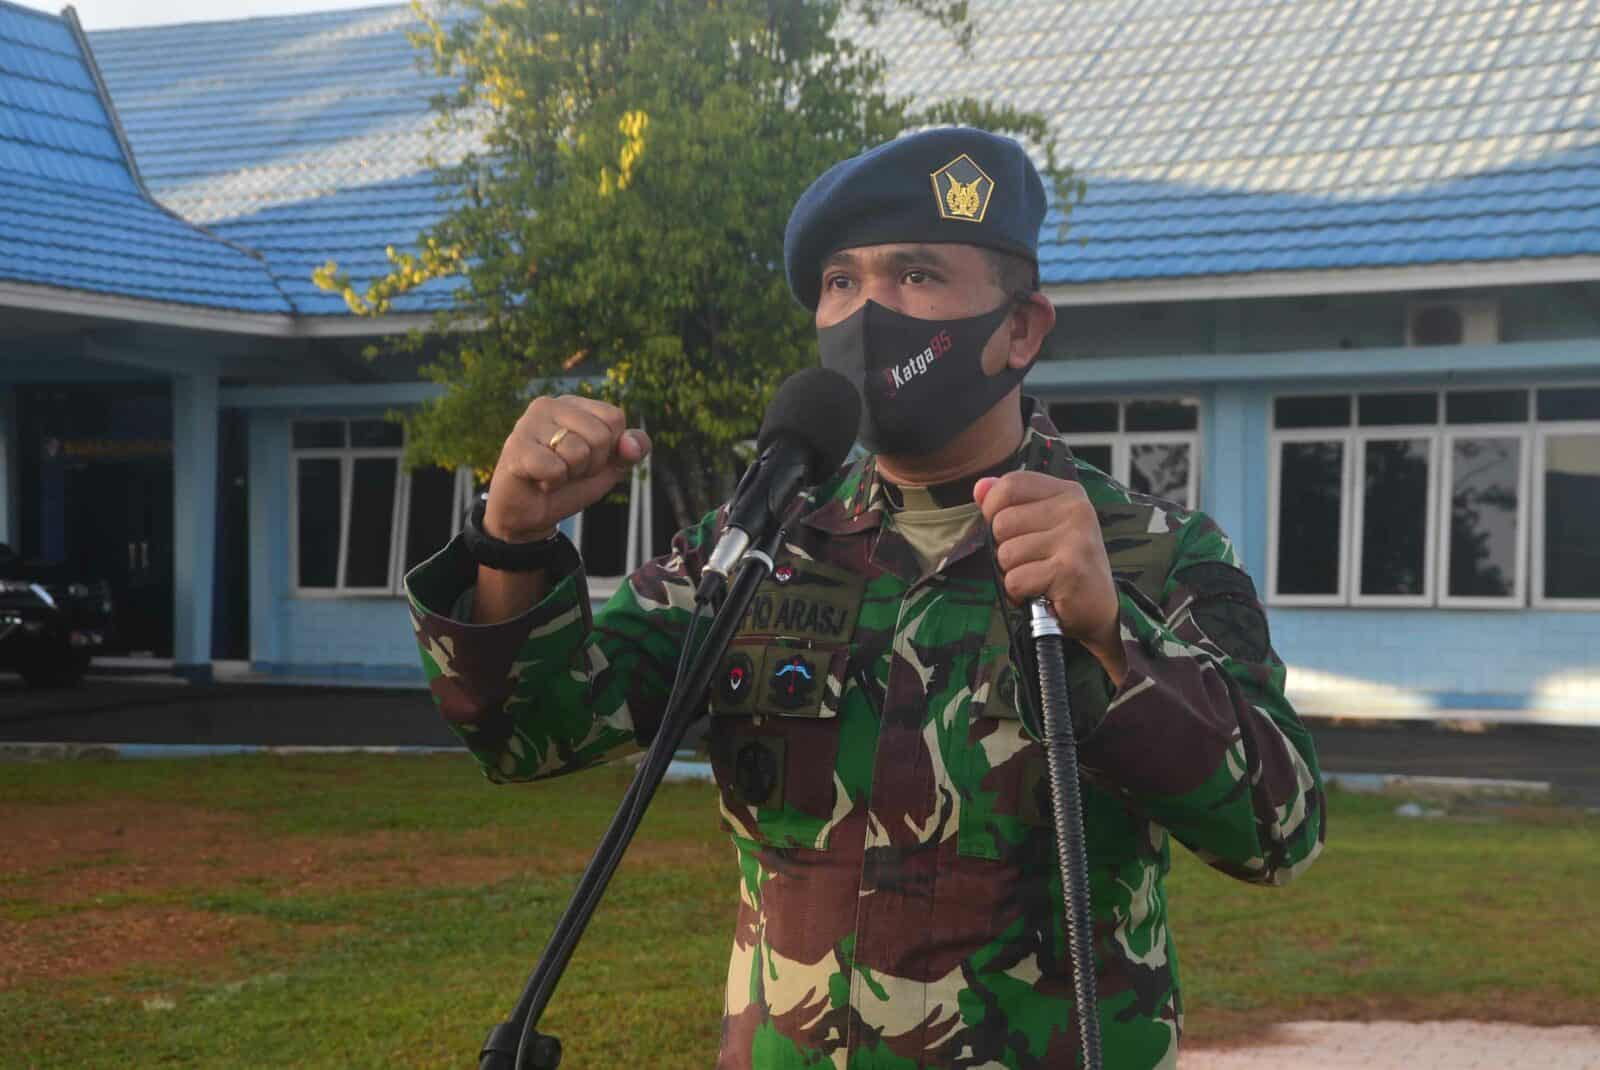 Mendukung Ketahanan Pangan Dalam Menghadapi Covid-19 Komandan Lanud Sjamsudin Noor menyerahkan Media Tanam Kepada Warga Lanud Sjamsudin Noor